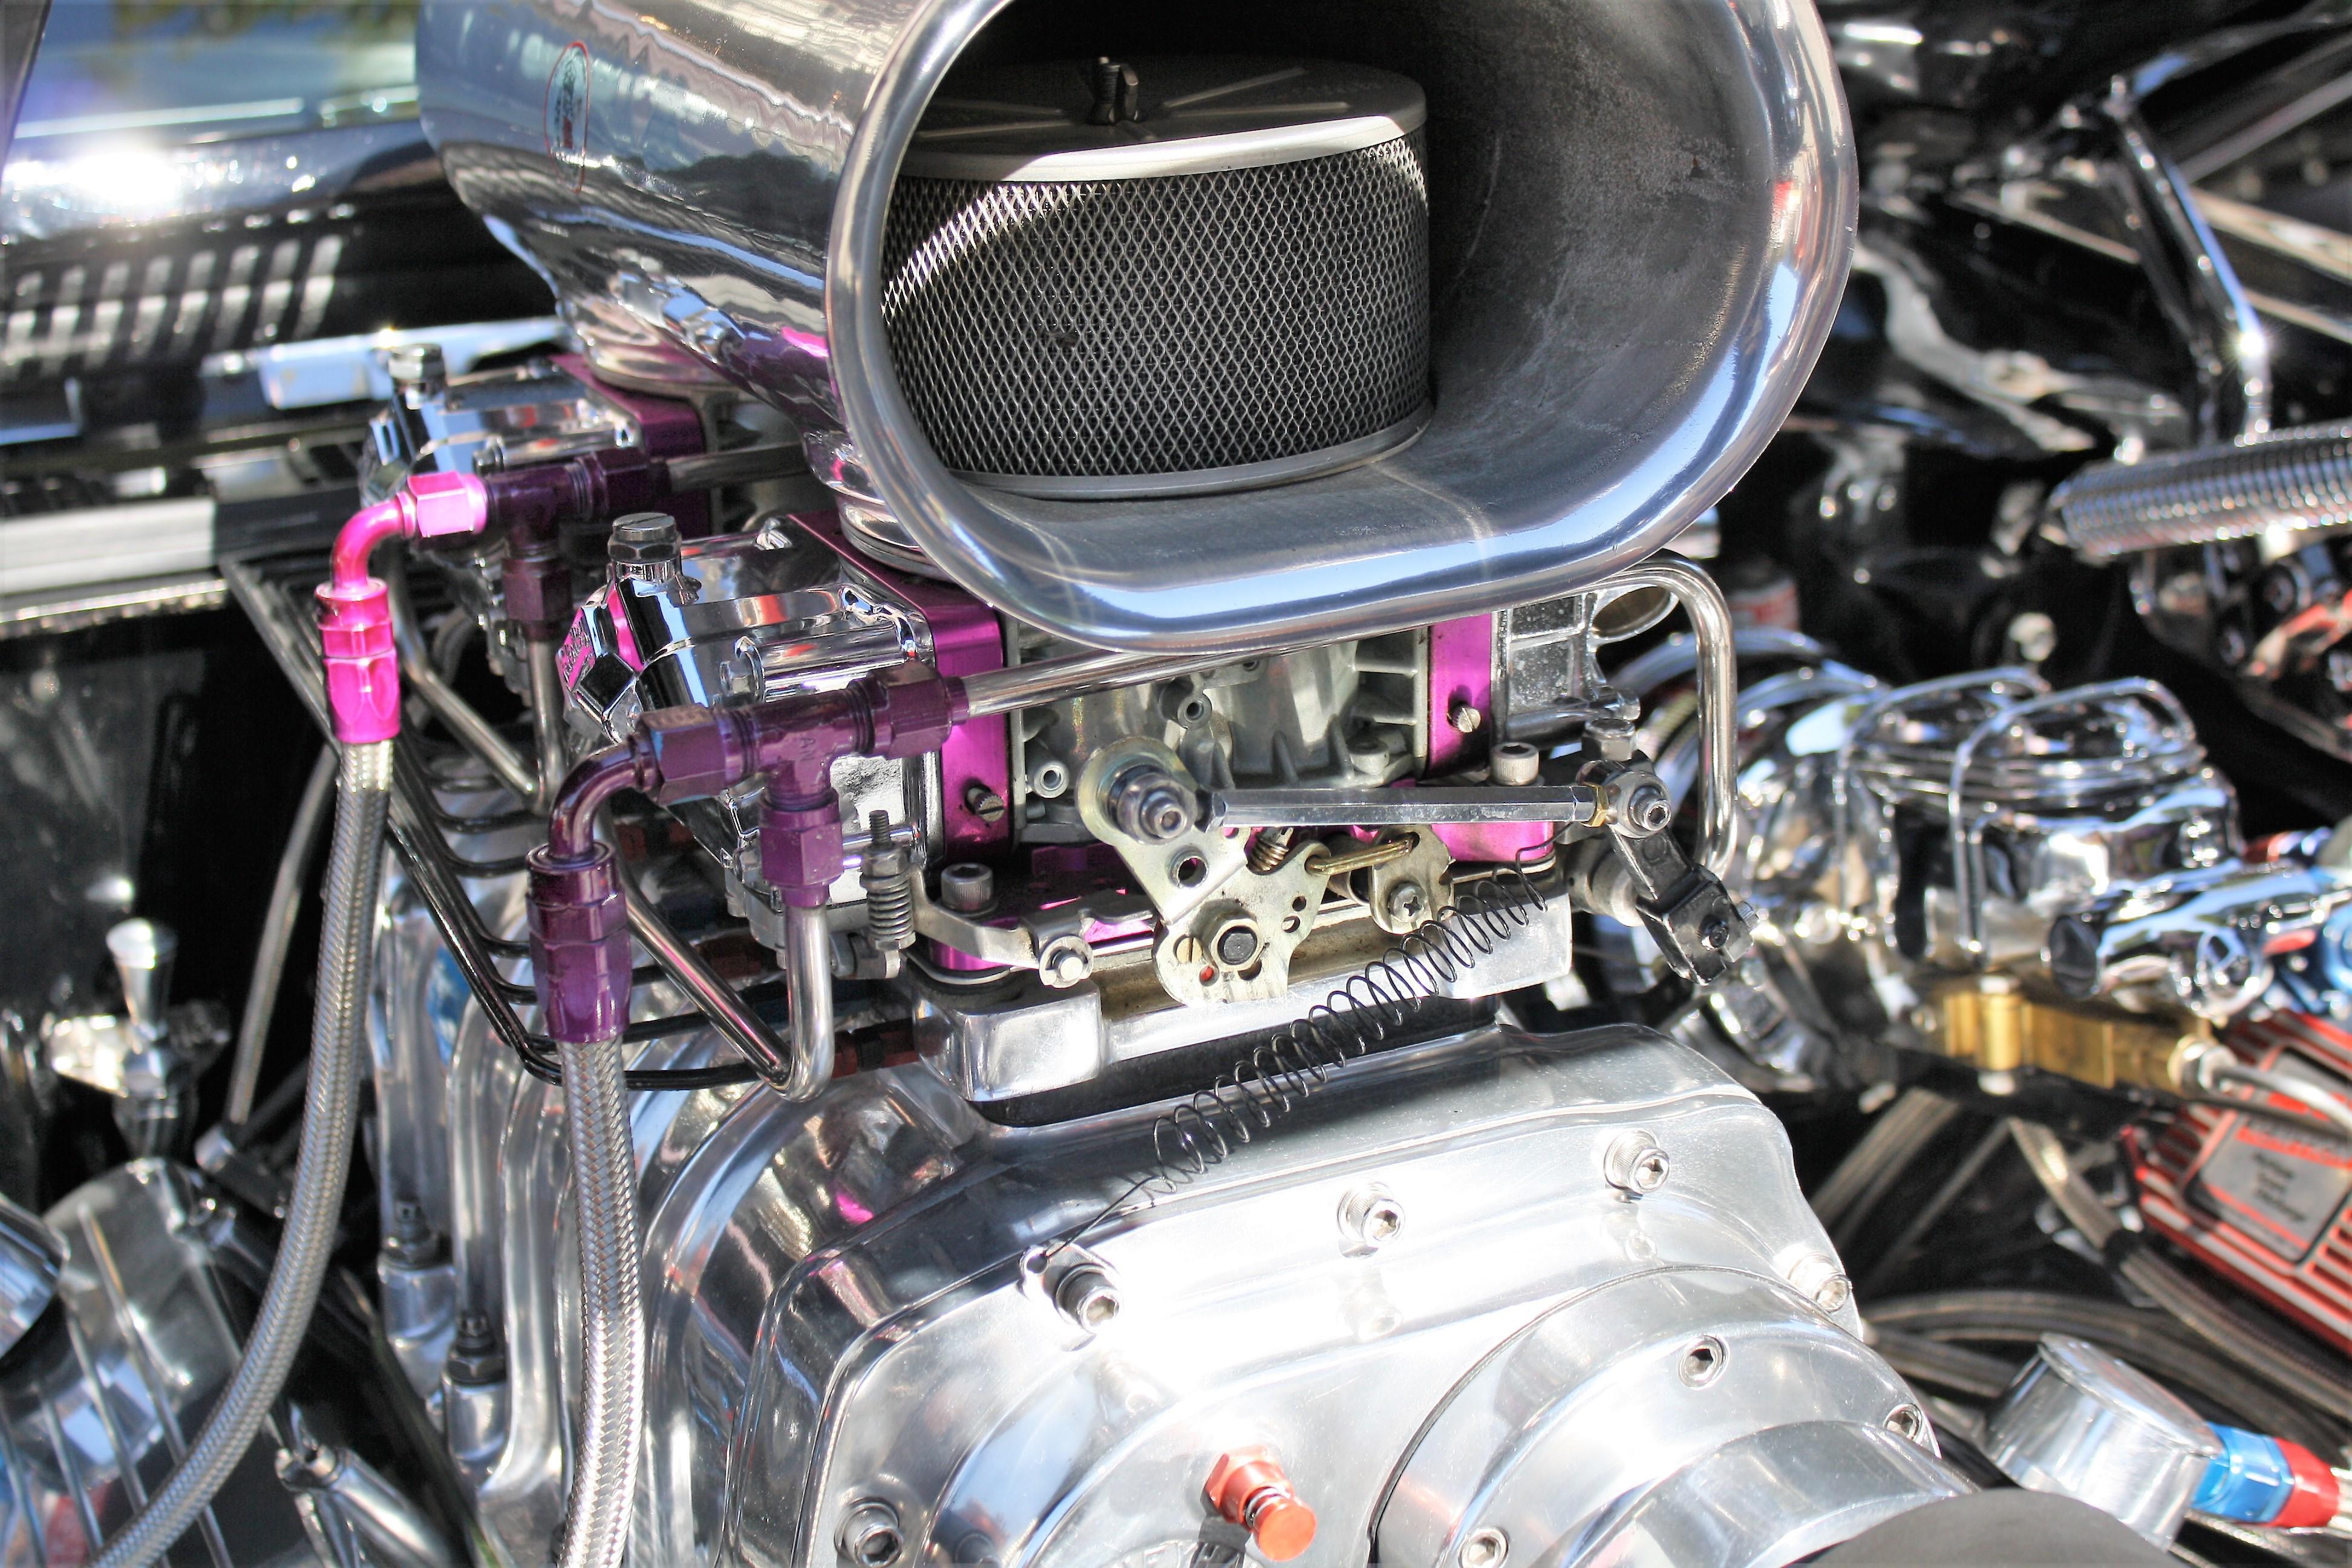 DM_vehicles_cars_engines_7339